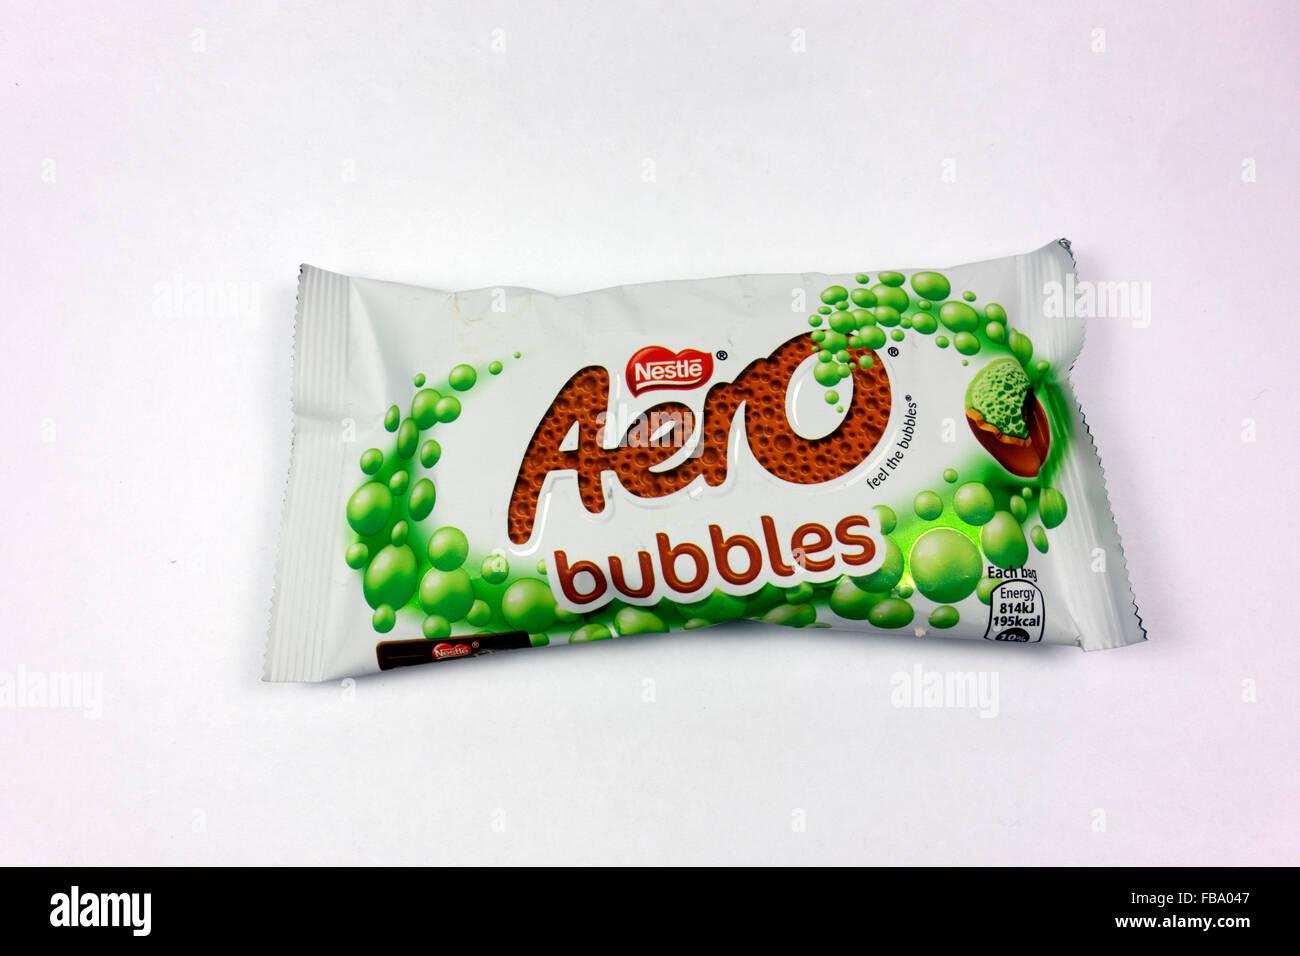 Mint Aero Bubbles. Stock Photo